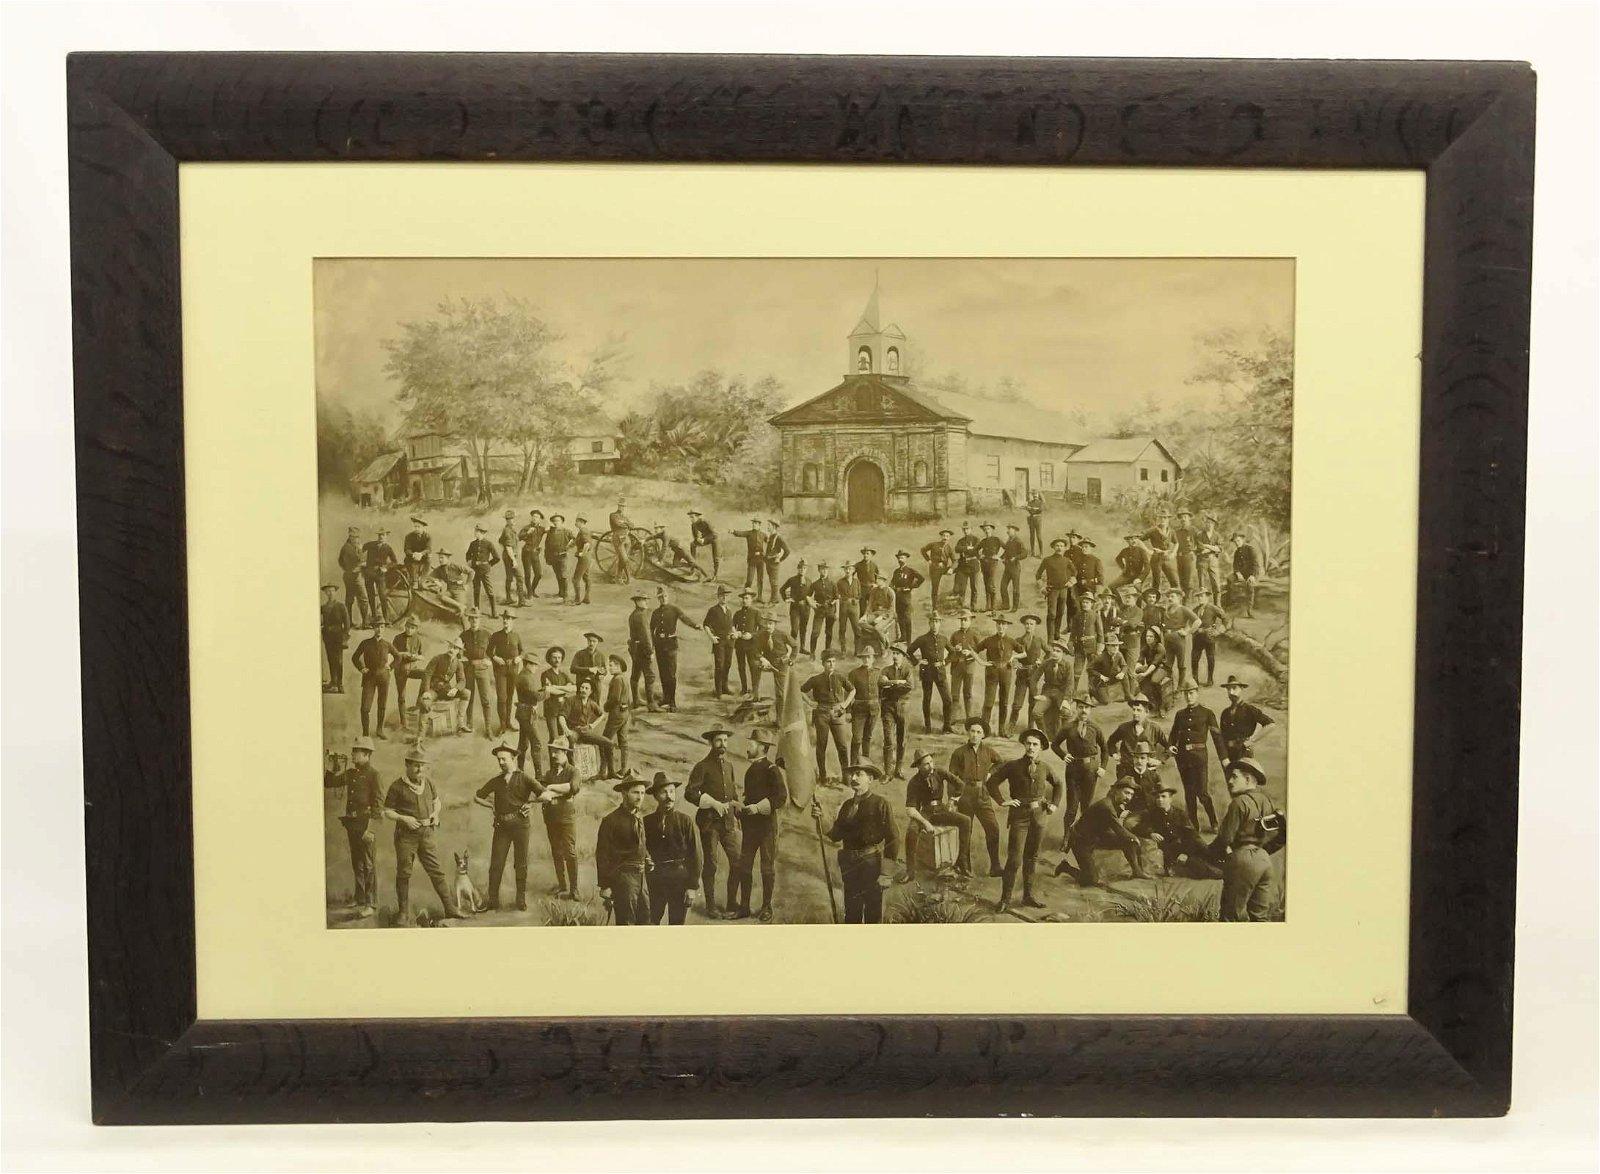 Spanish American War Photo Print Collage